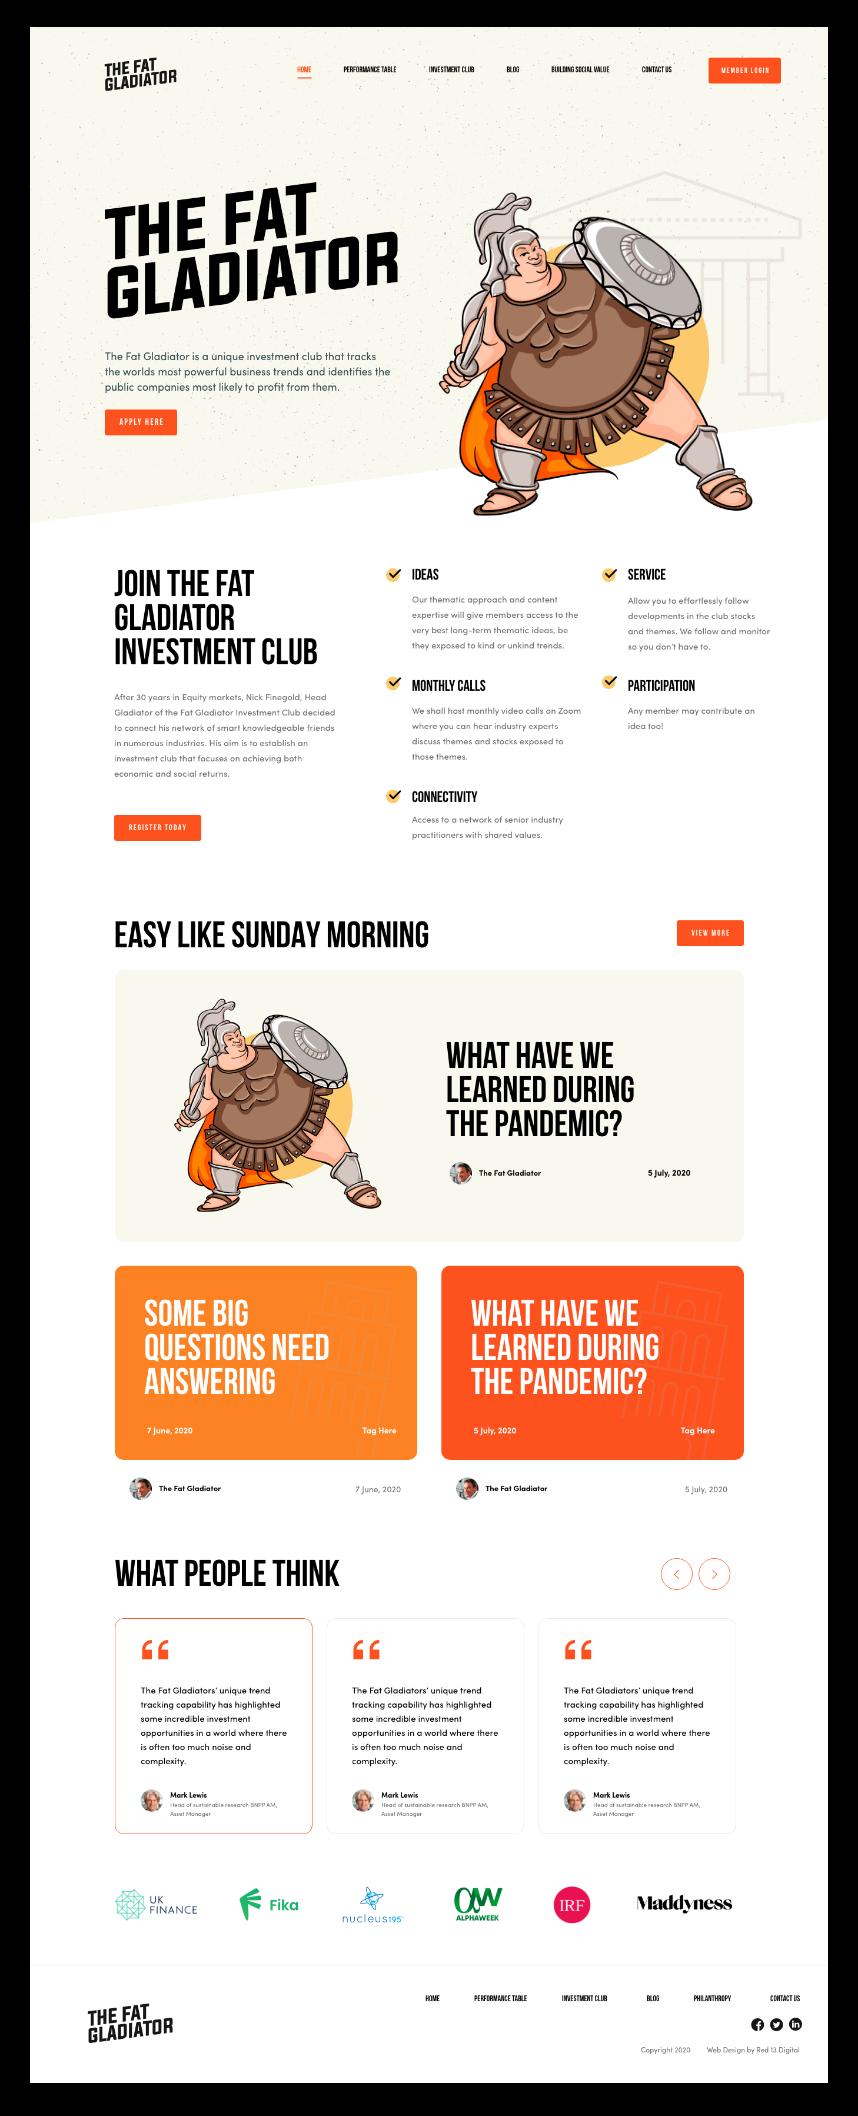 Brand Development & Web Design For The Fat Gladiator